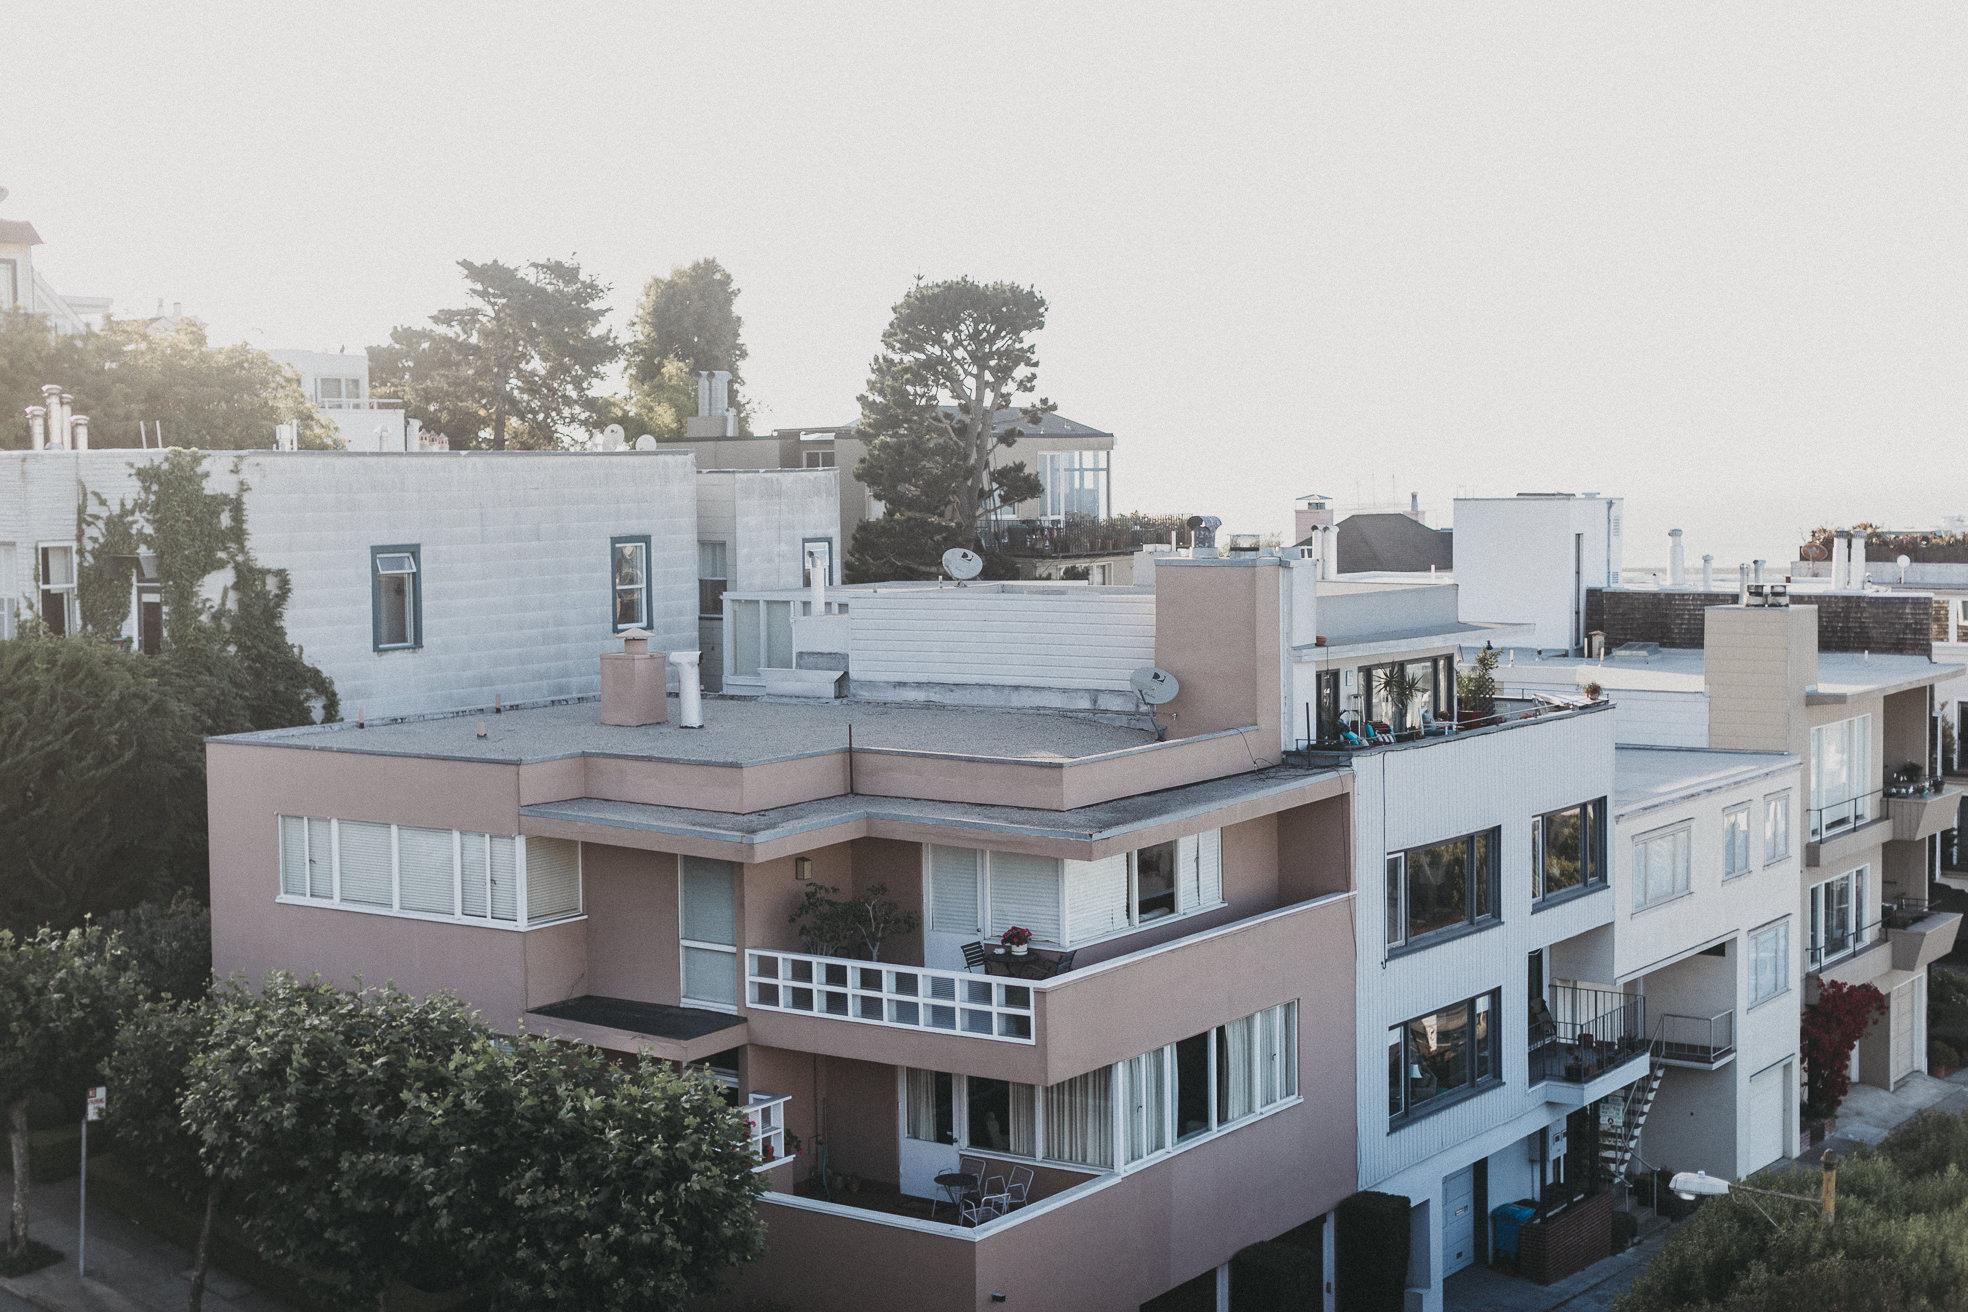 San-Francisco-BildervomLeben-8781